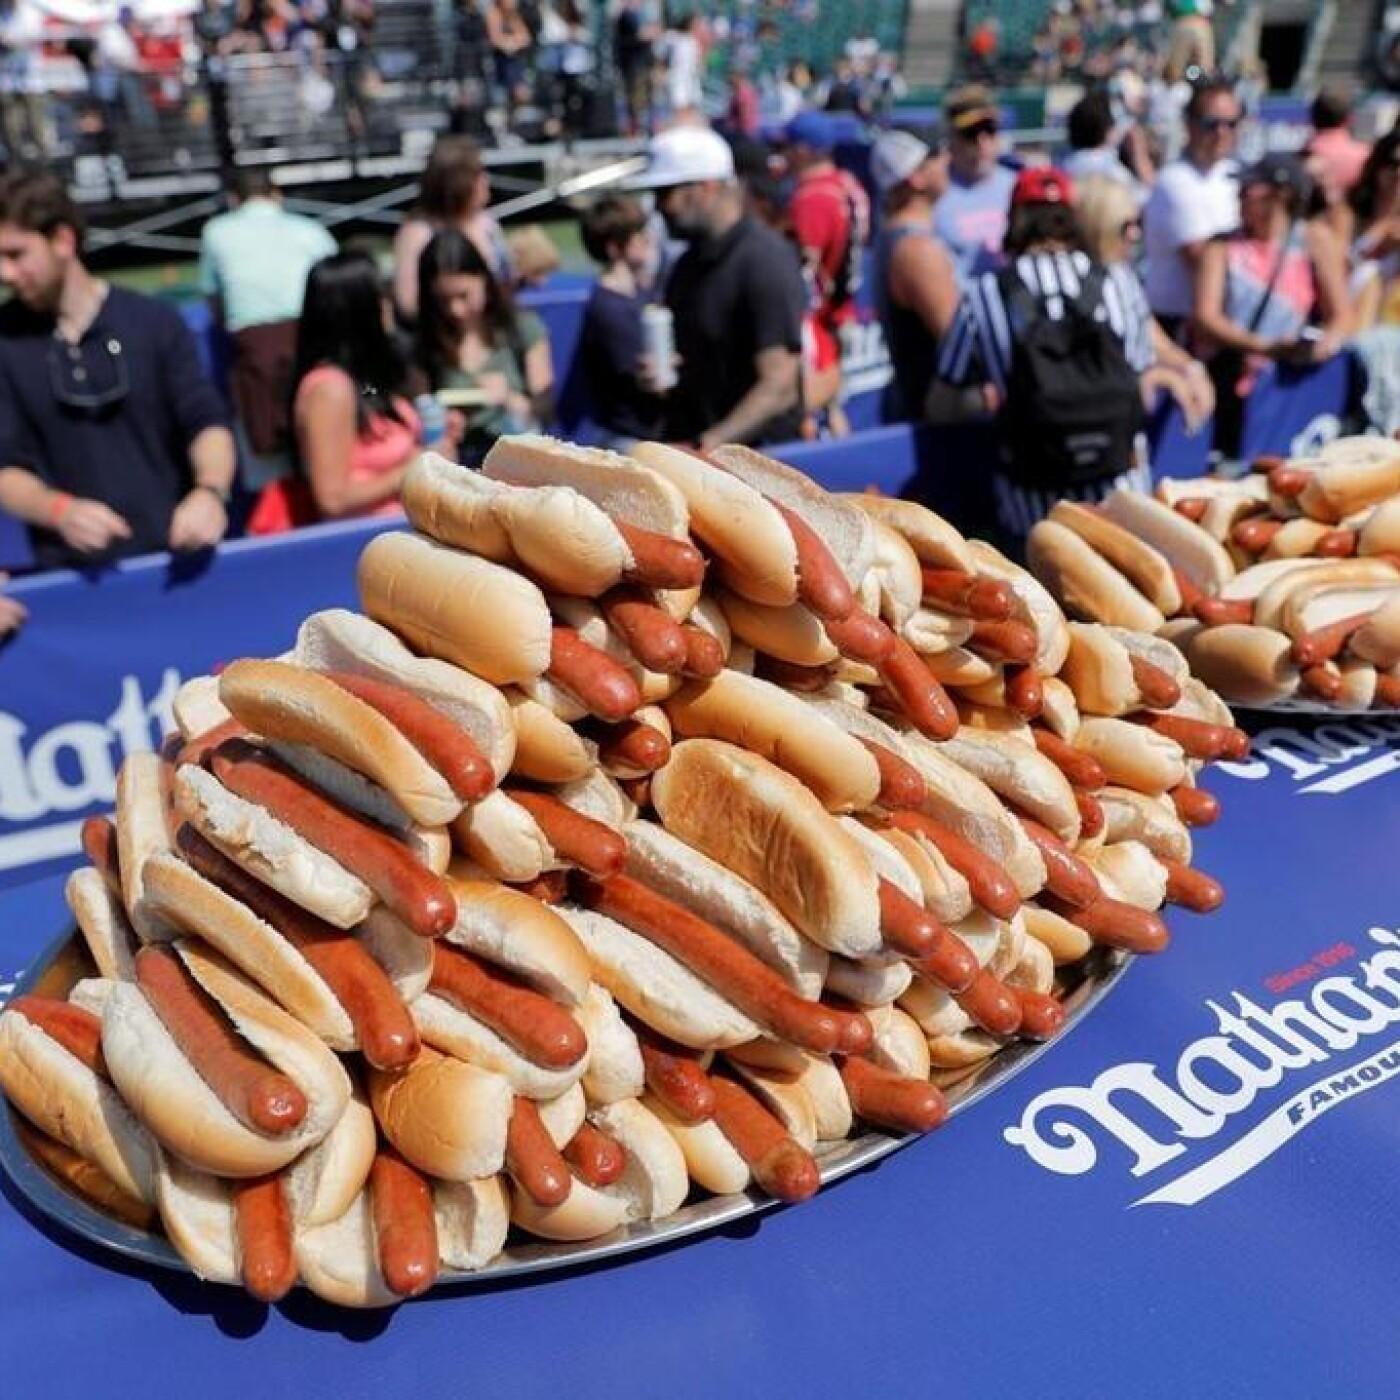 Chiffre du jour,76 hot-dog en 10 mn - 06 07 2021 - StereoChic Radio